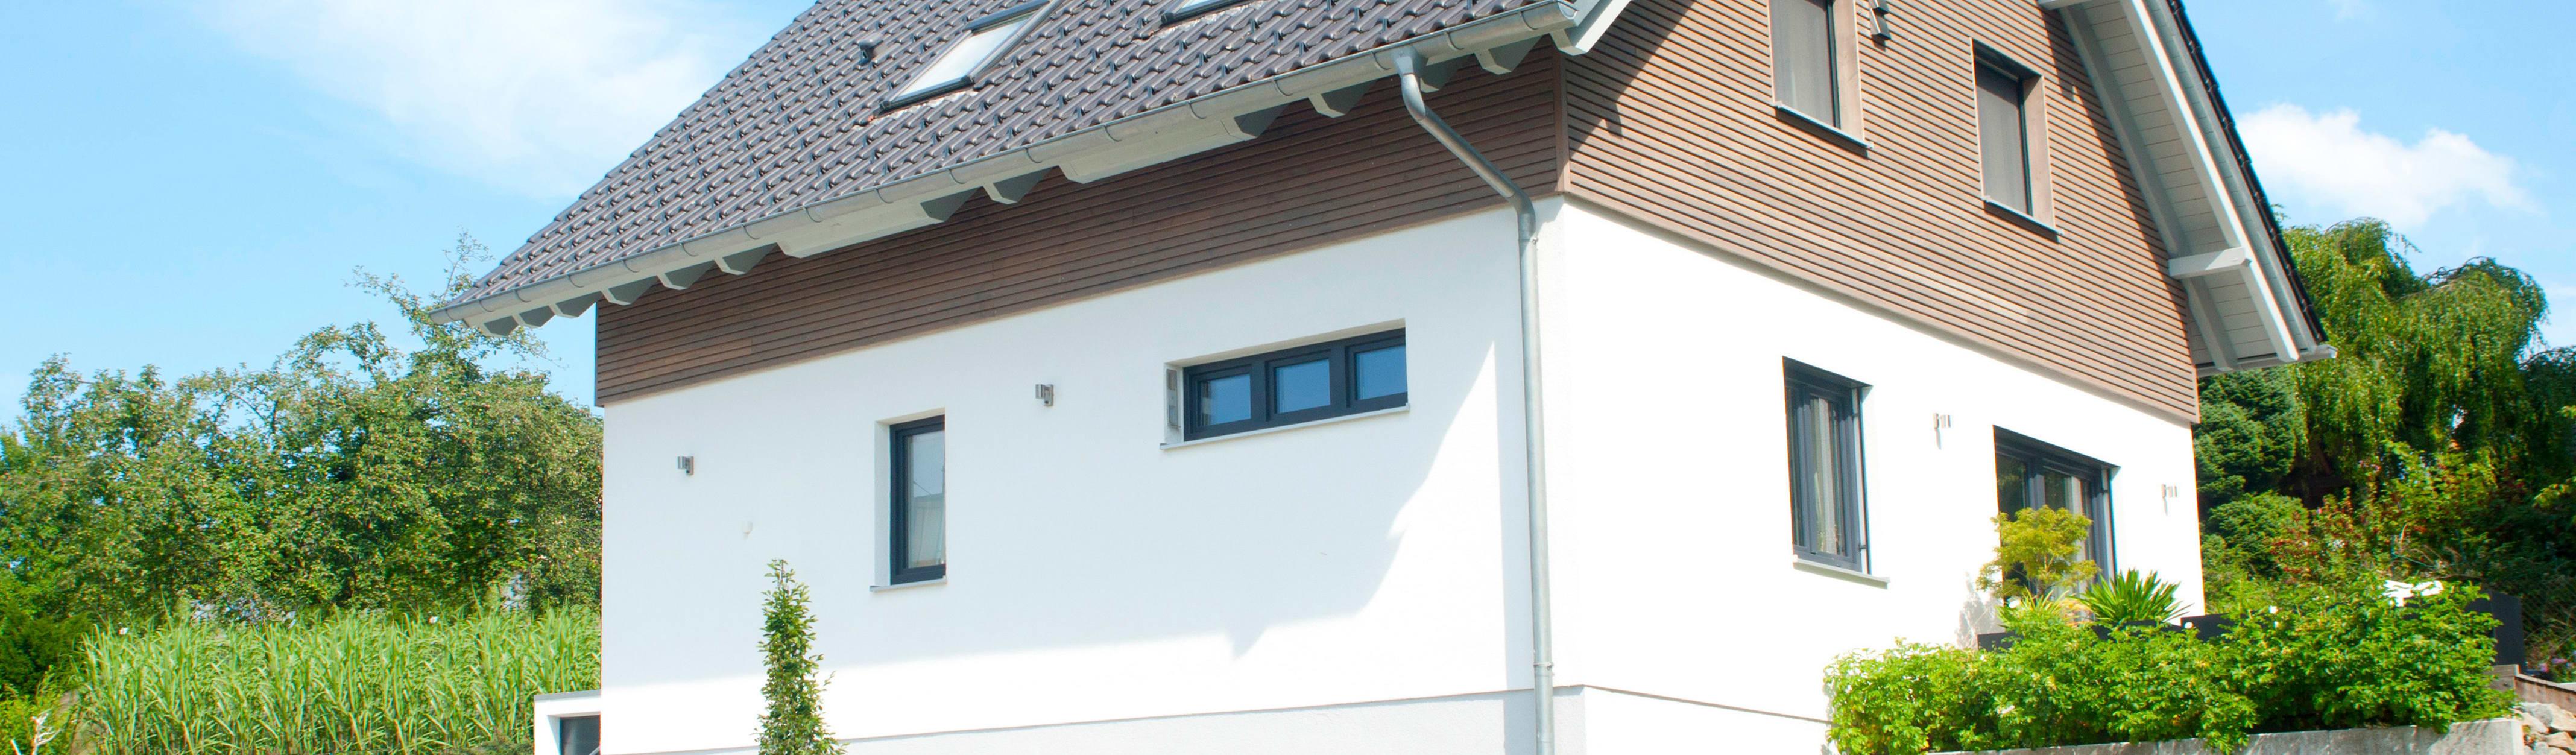 esendo GmbH – massiv aus holz & lehm